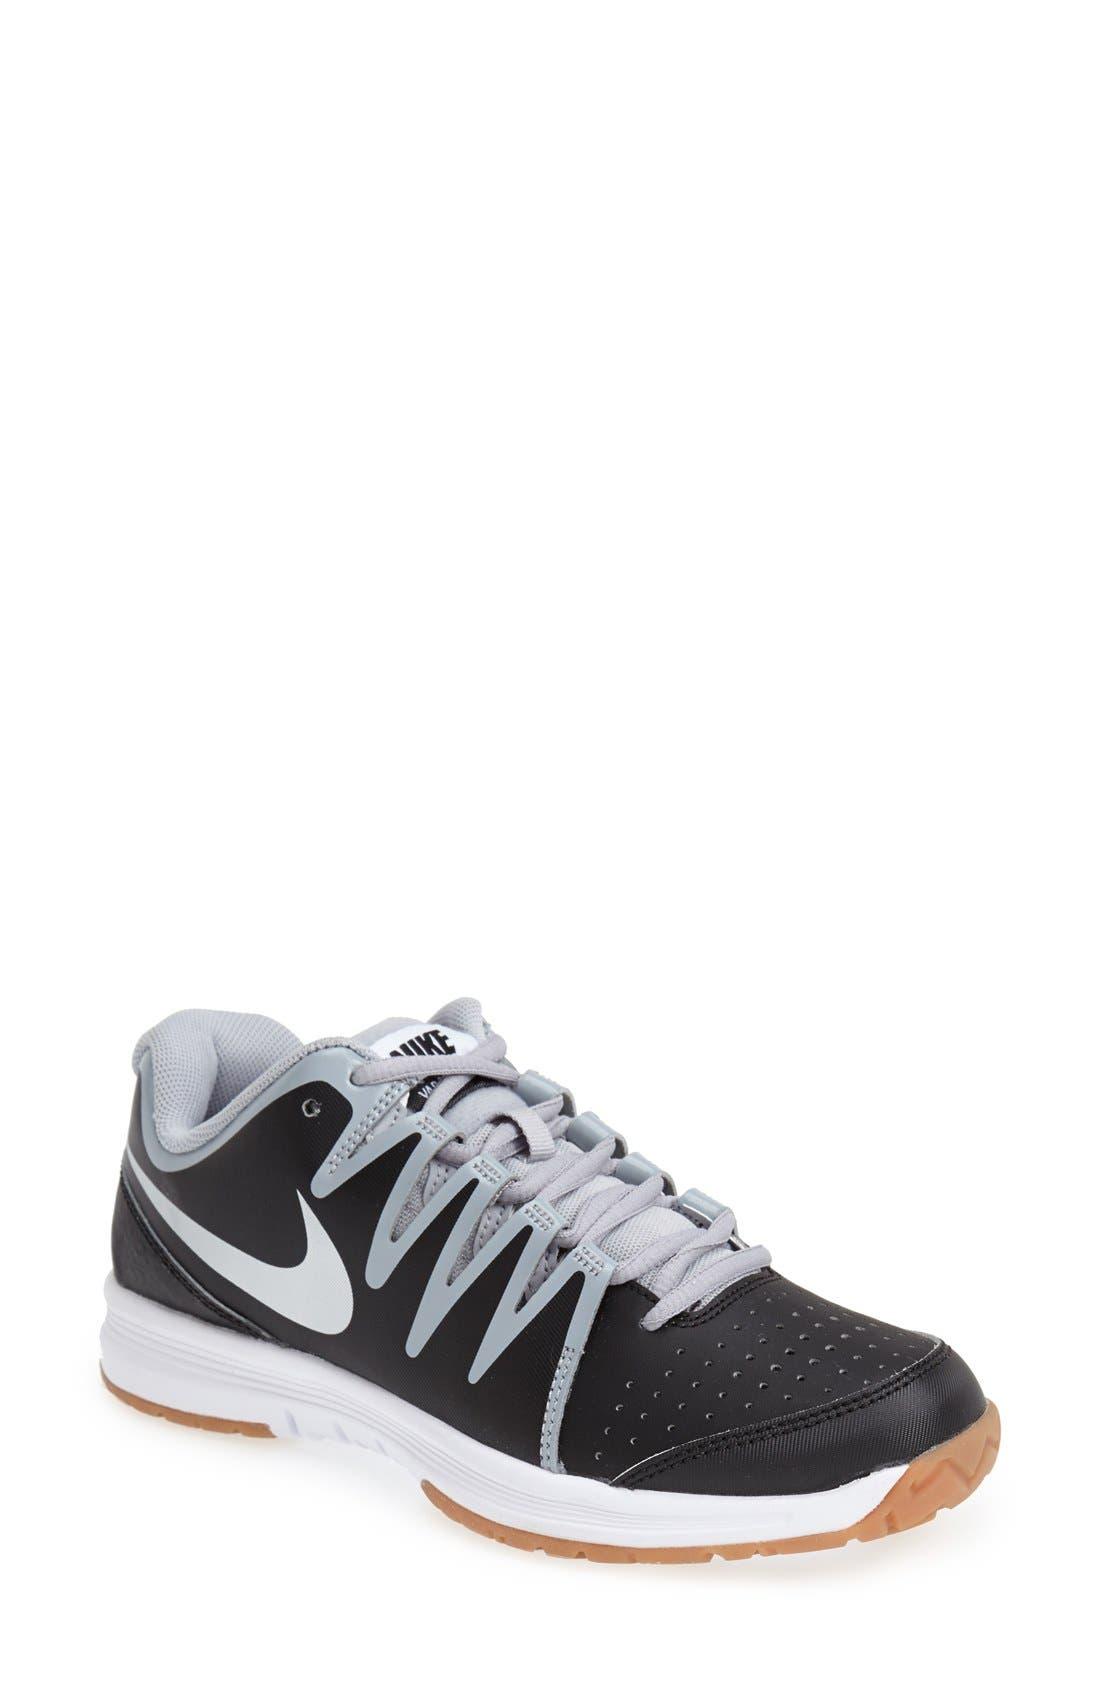 Main Image - Nike 'Air Vapor - Indoor Court' Tennis Shoe (Women)